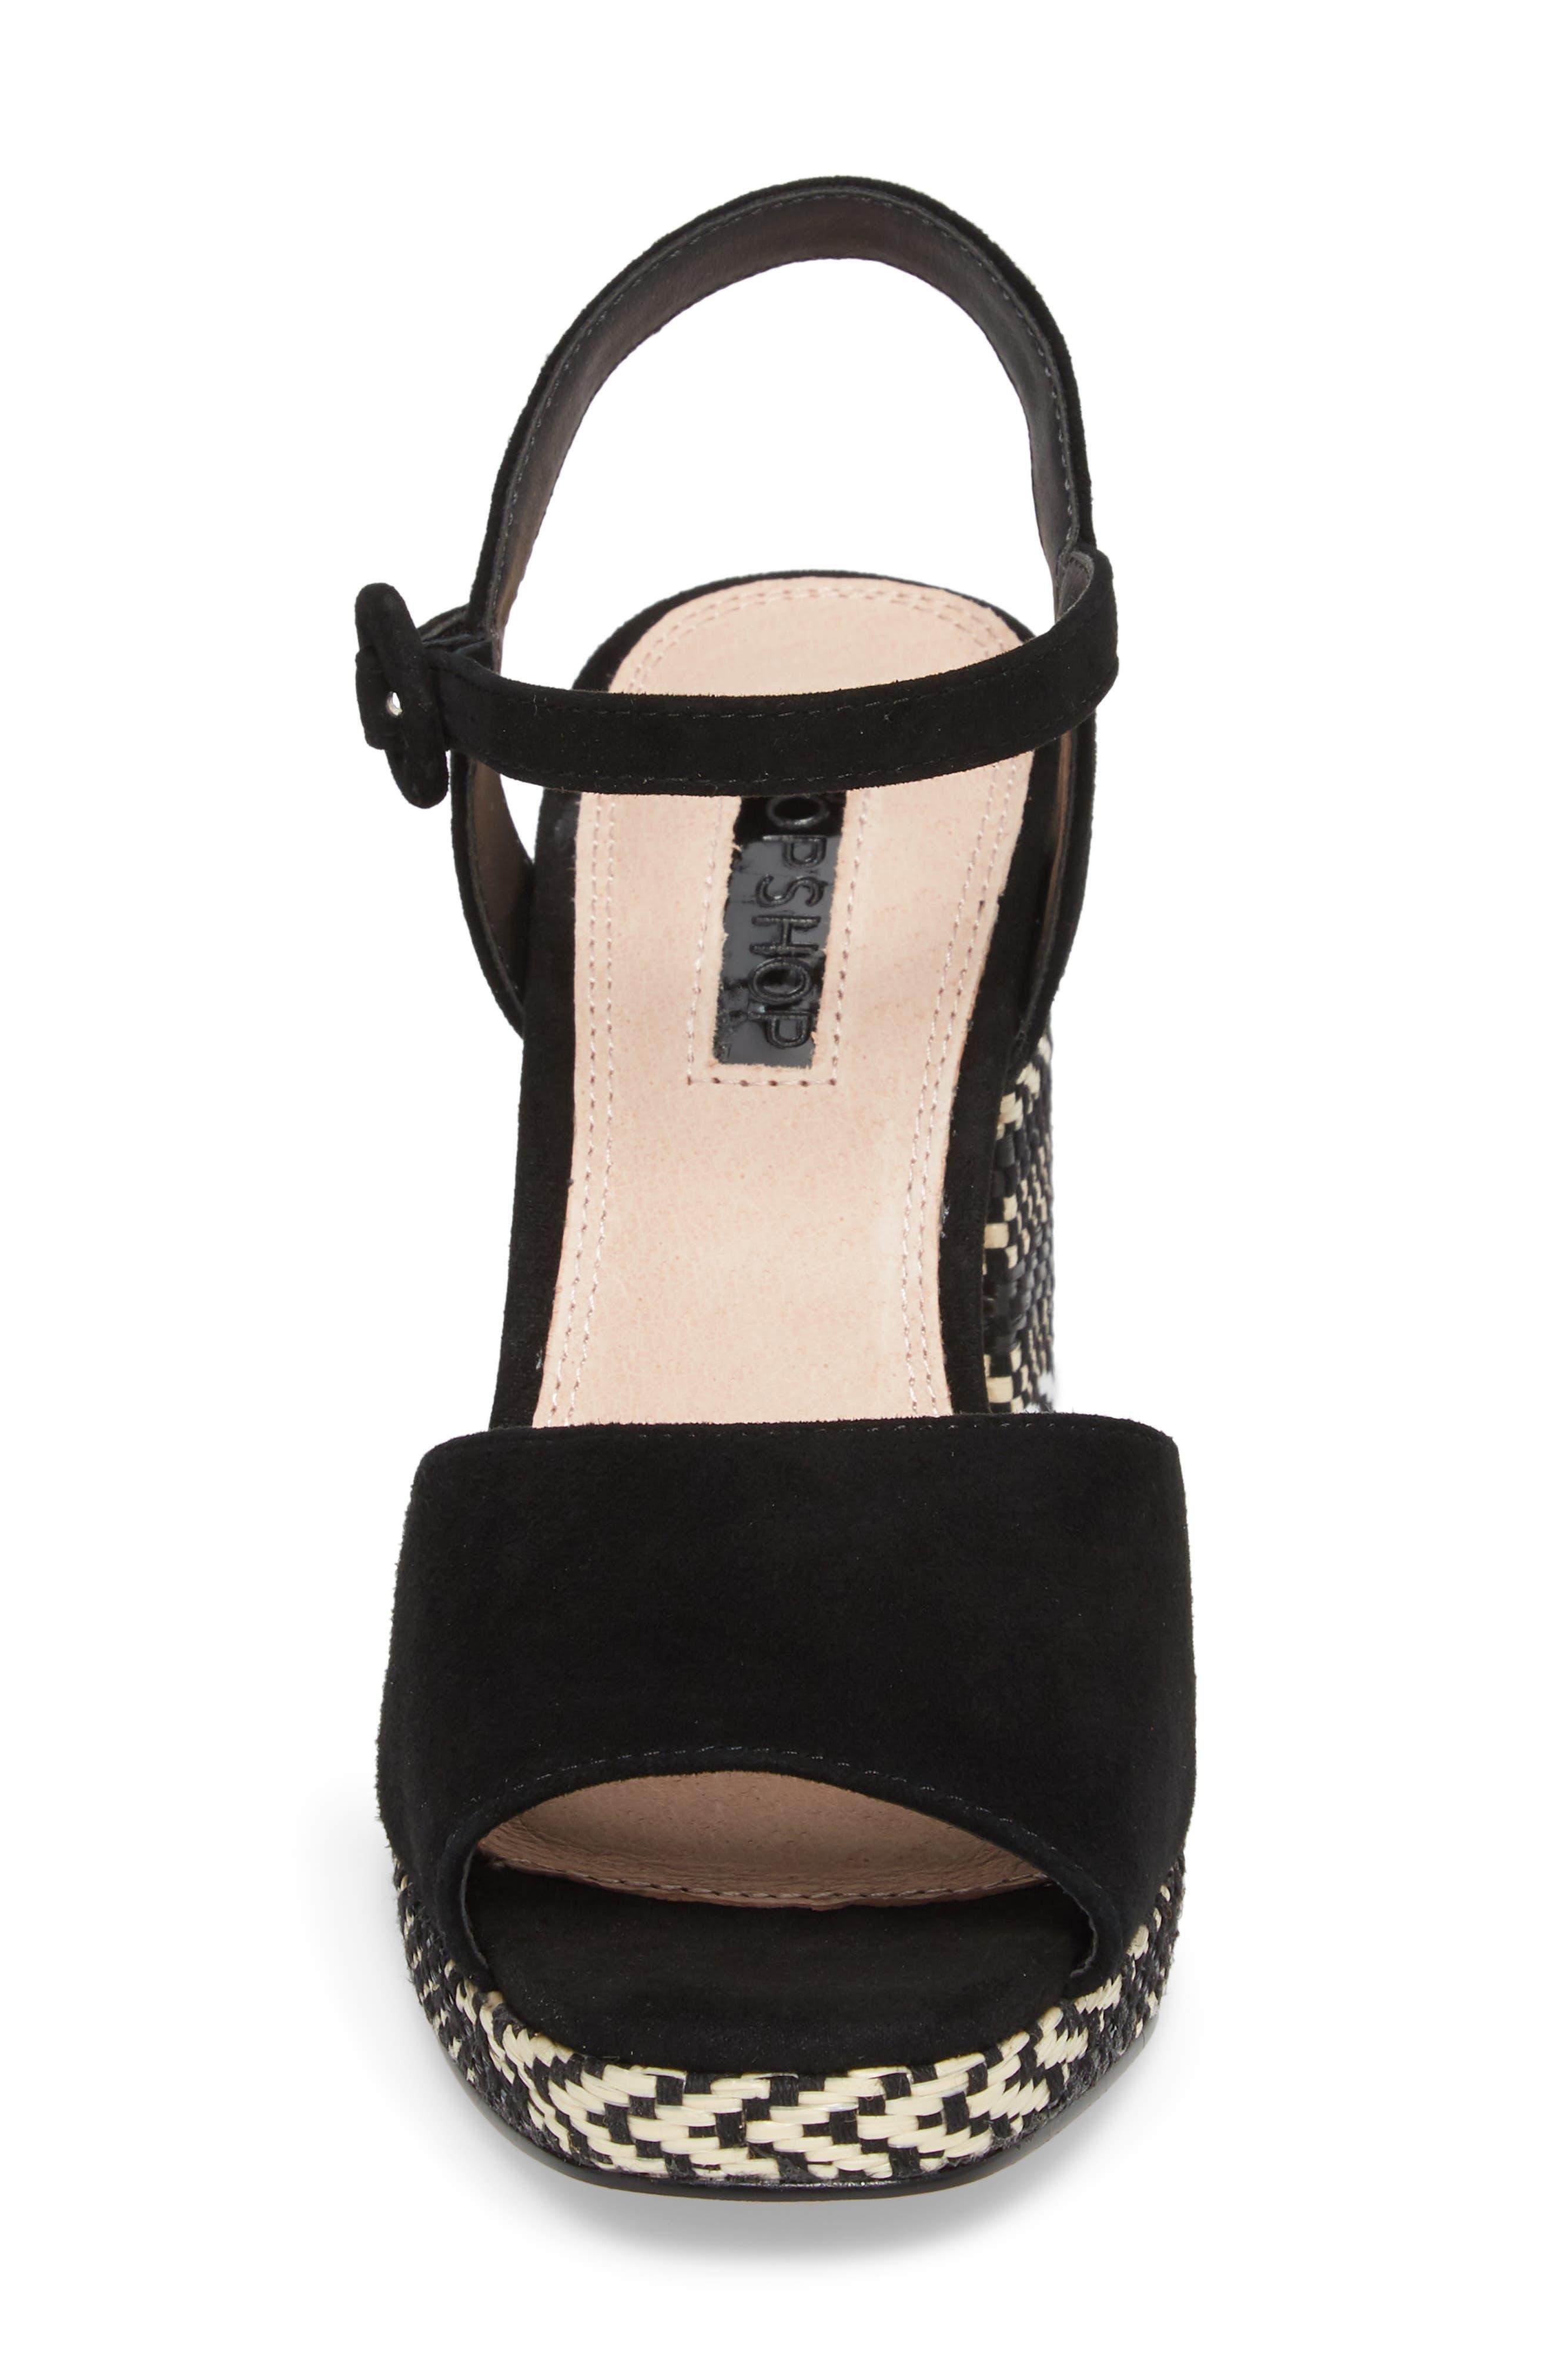 Laura Woven Block Heel Sandal,                             Alternate thumbnail 4, color,                             Black Multi